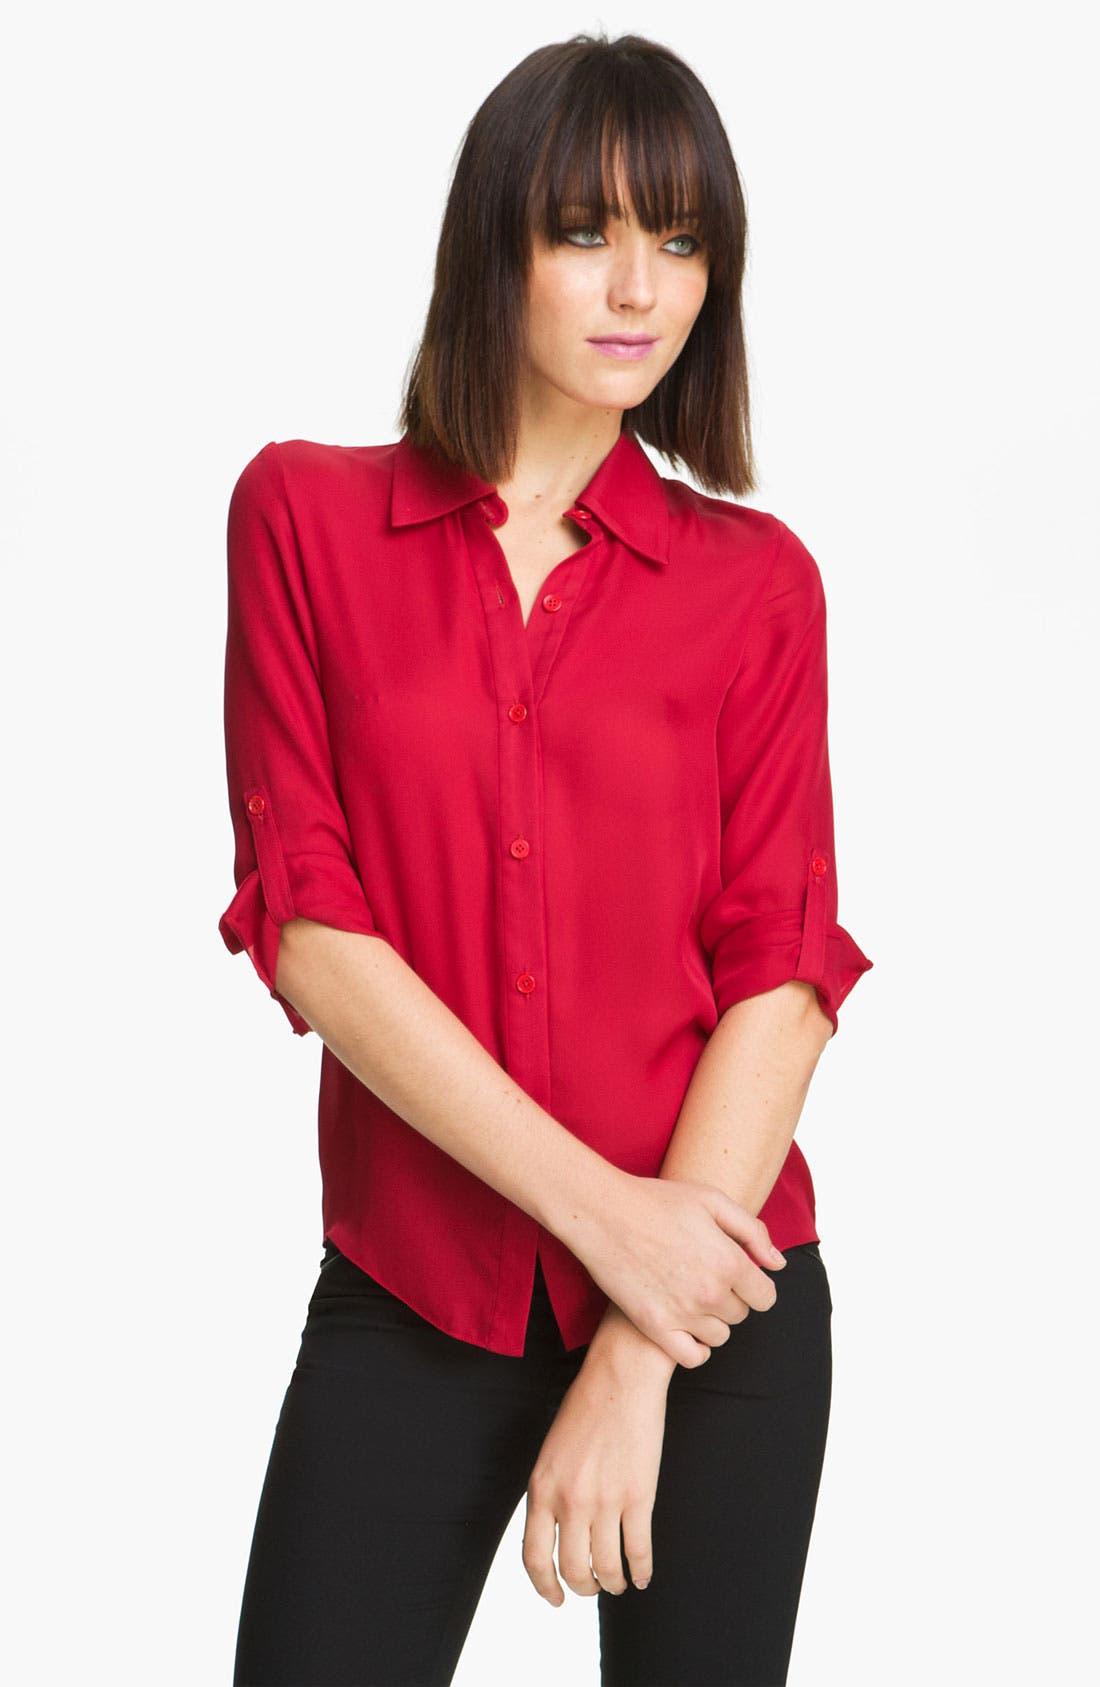 Alternate Image 1 Selected - Alice + Olivia 'Thea' Stretch Silk Shirt